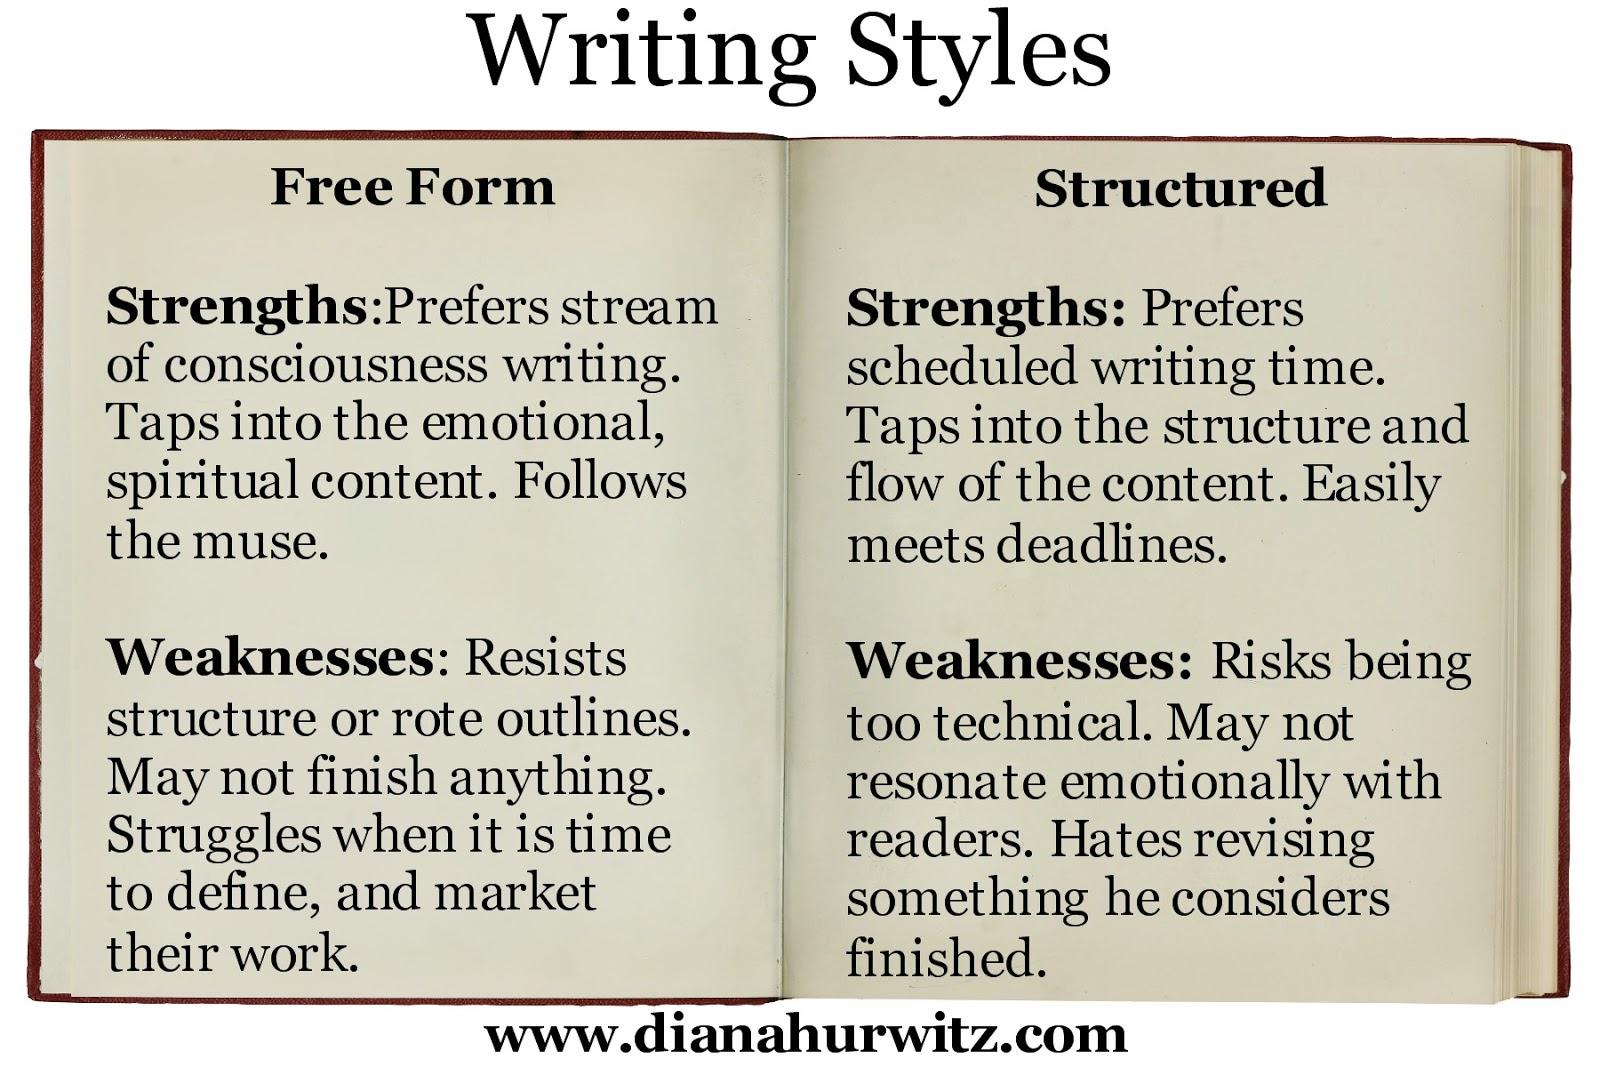 writer writing styles novel fiction story genre spectrum